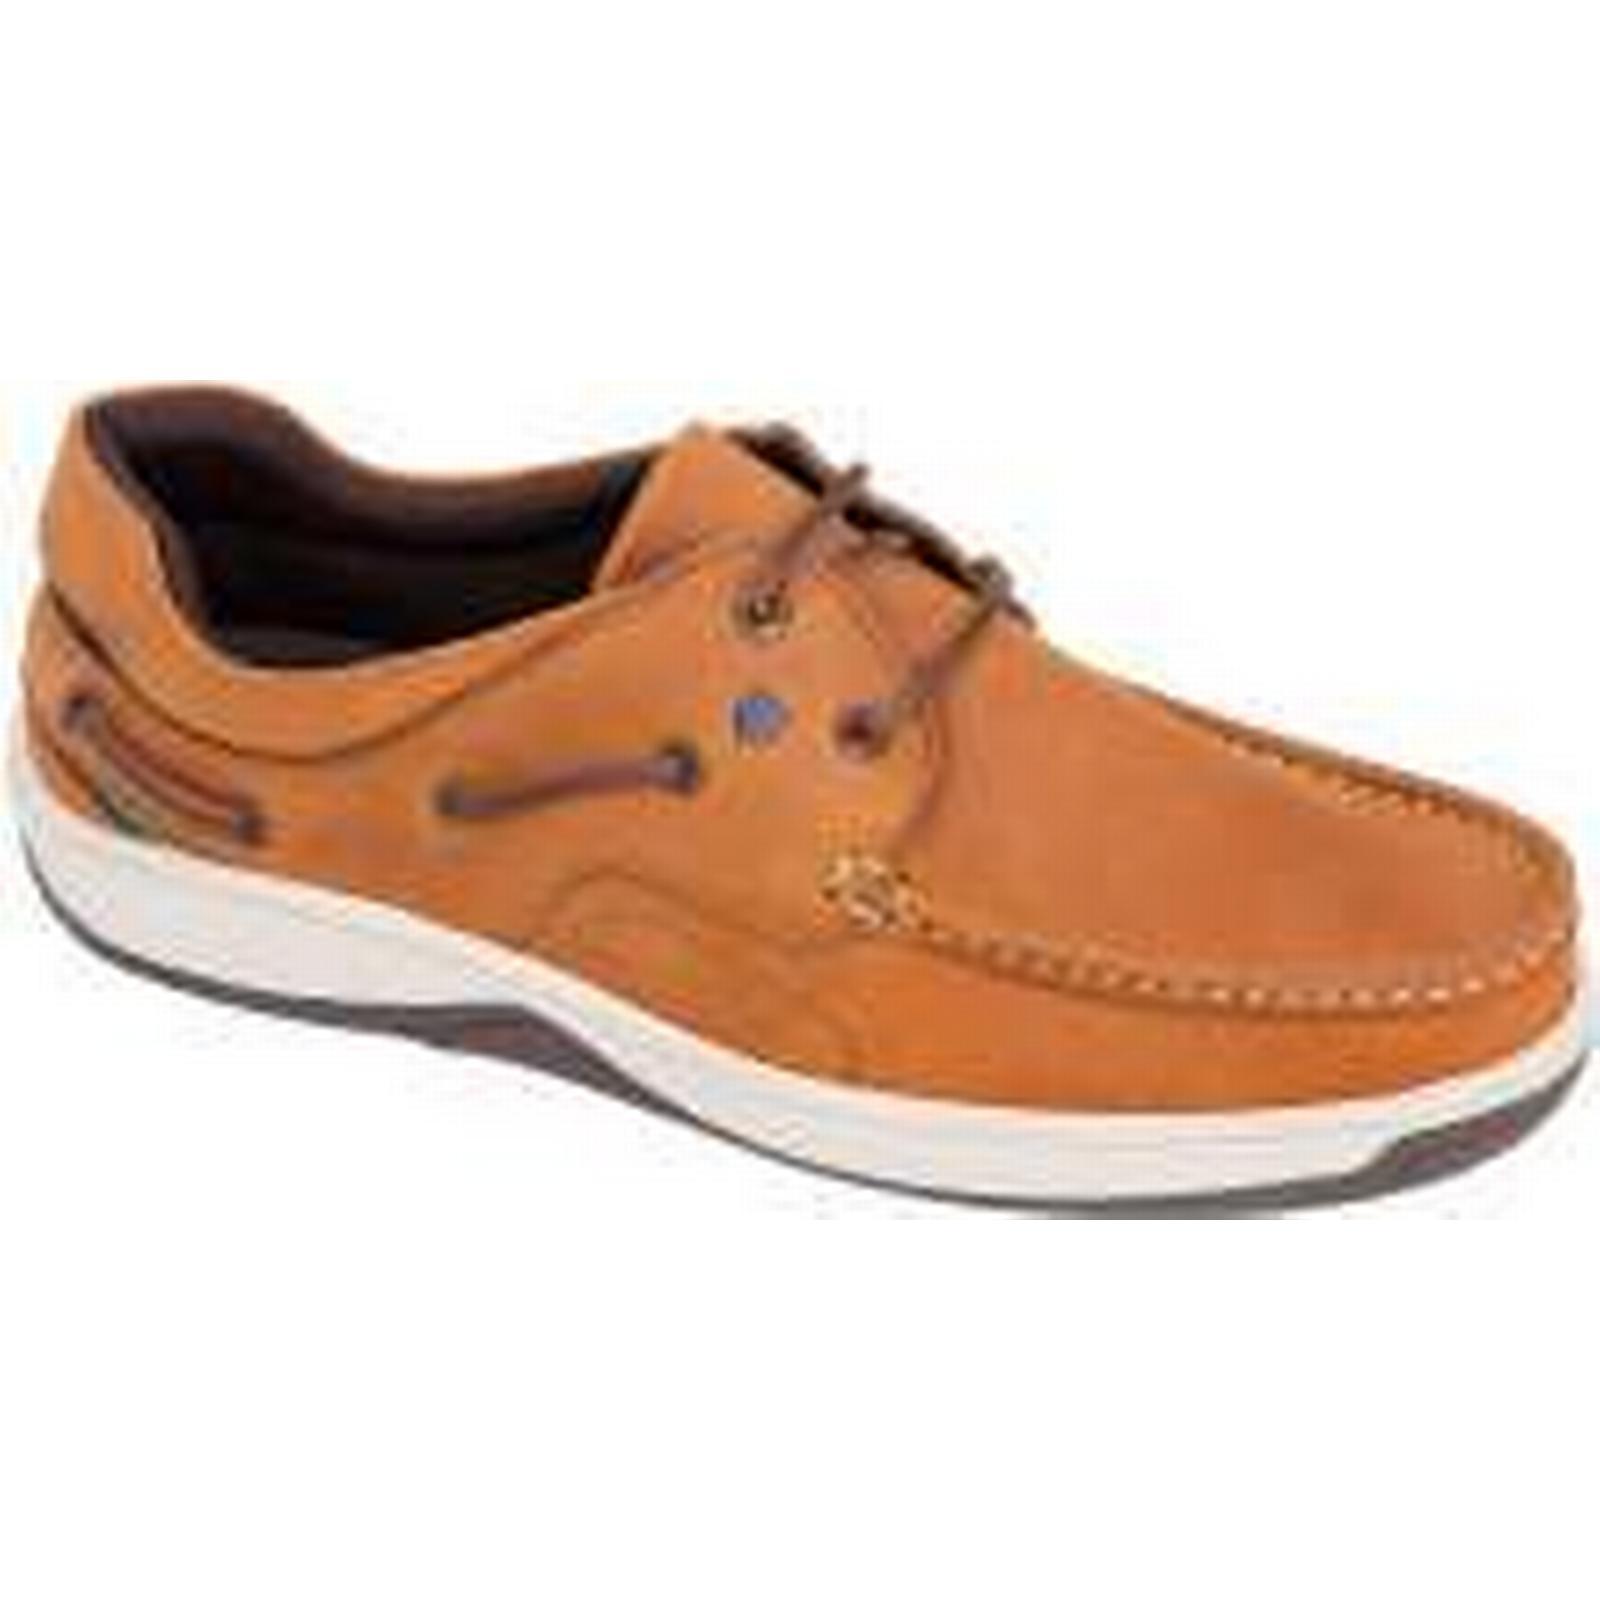 Dubarry Navigator Deck Shoes, Shoes, Deck Whiskey, UK7 271c60